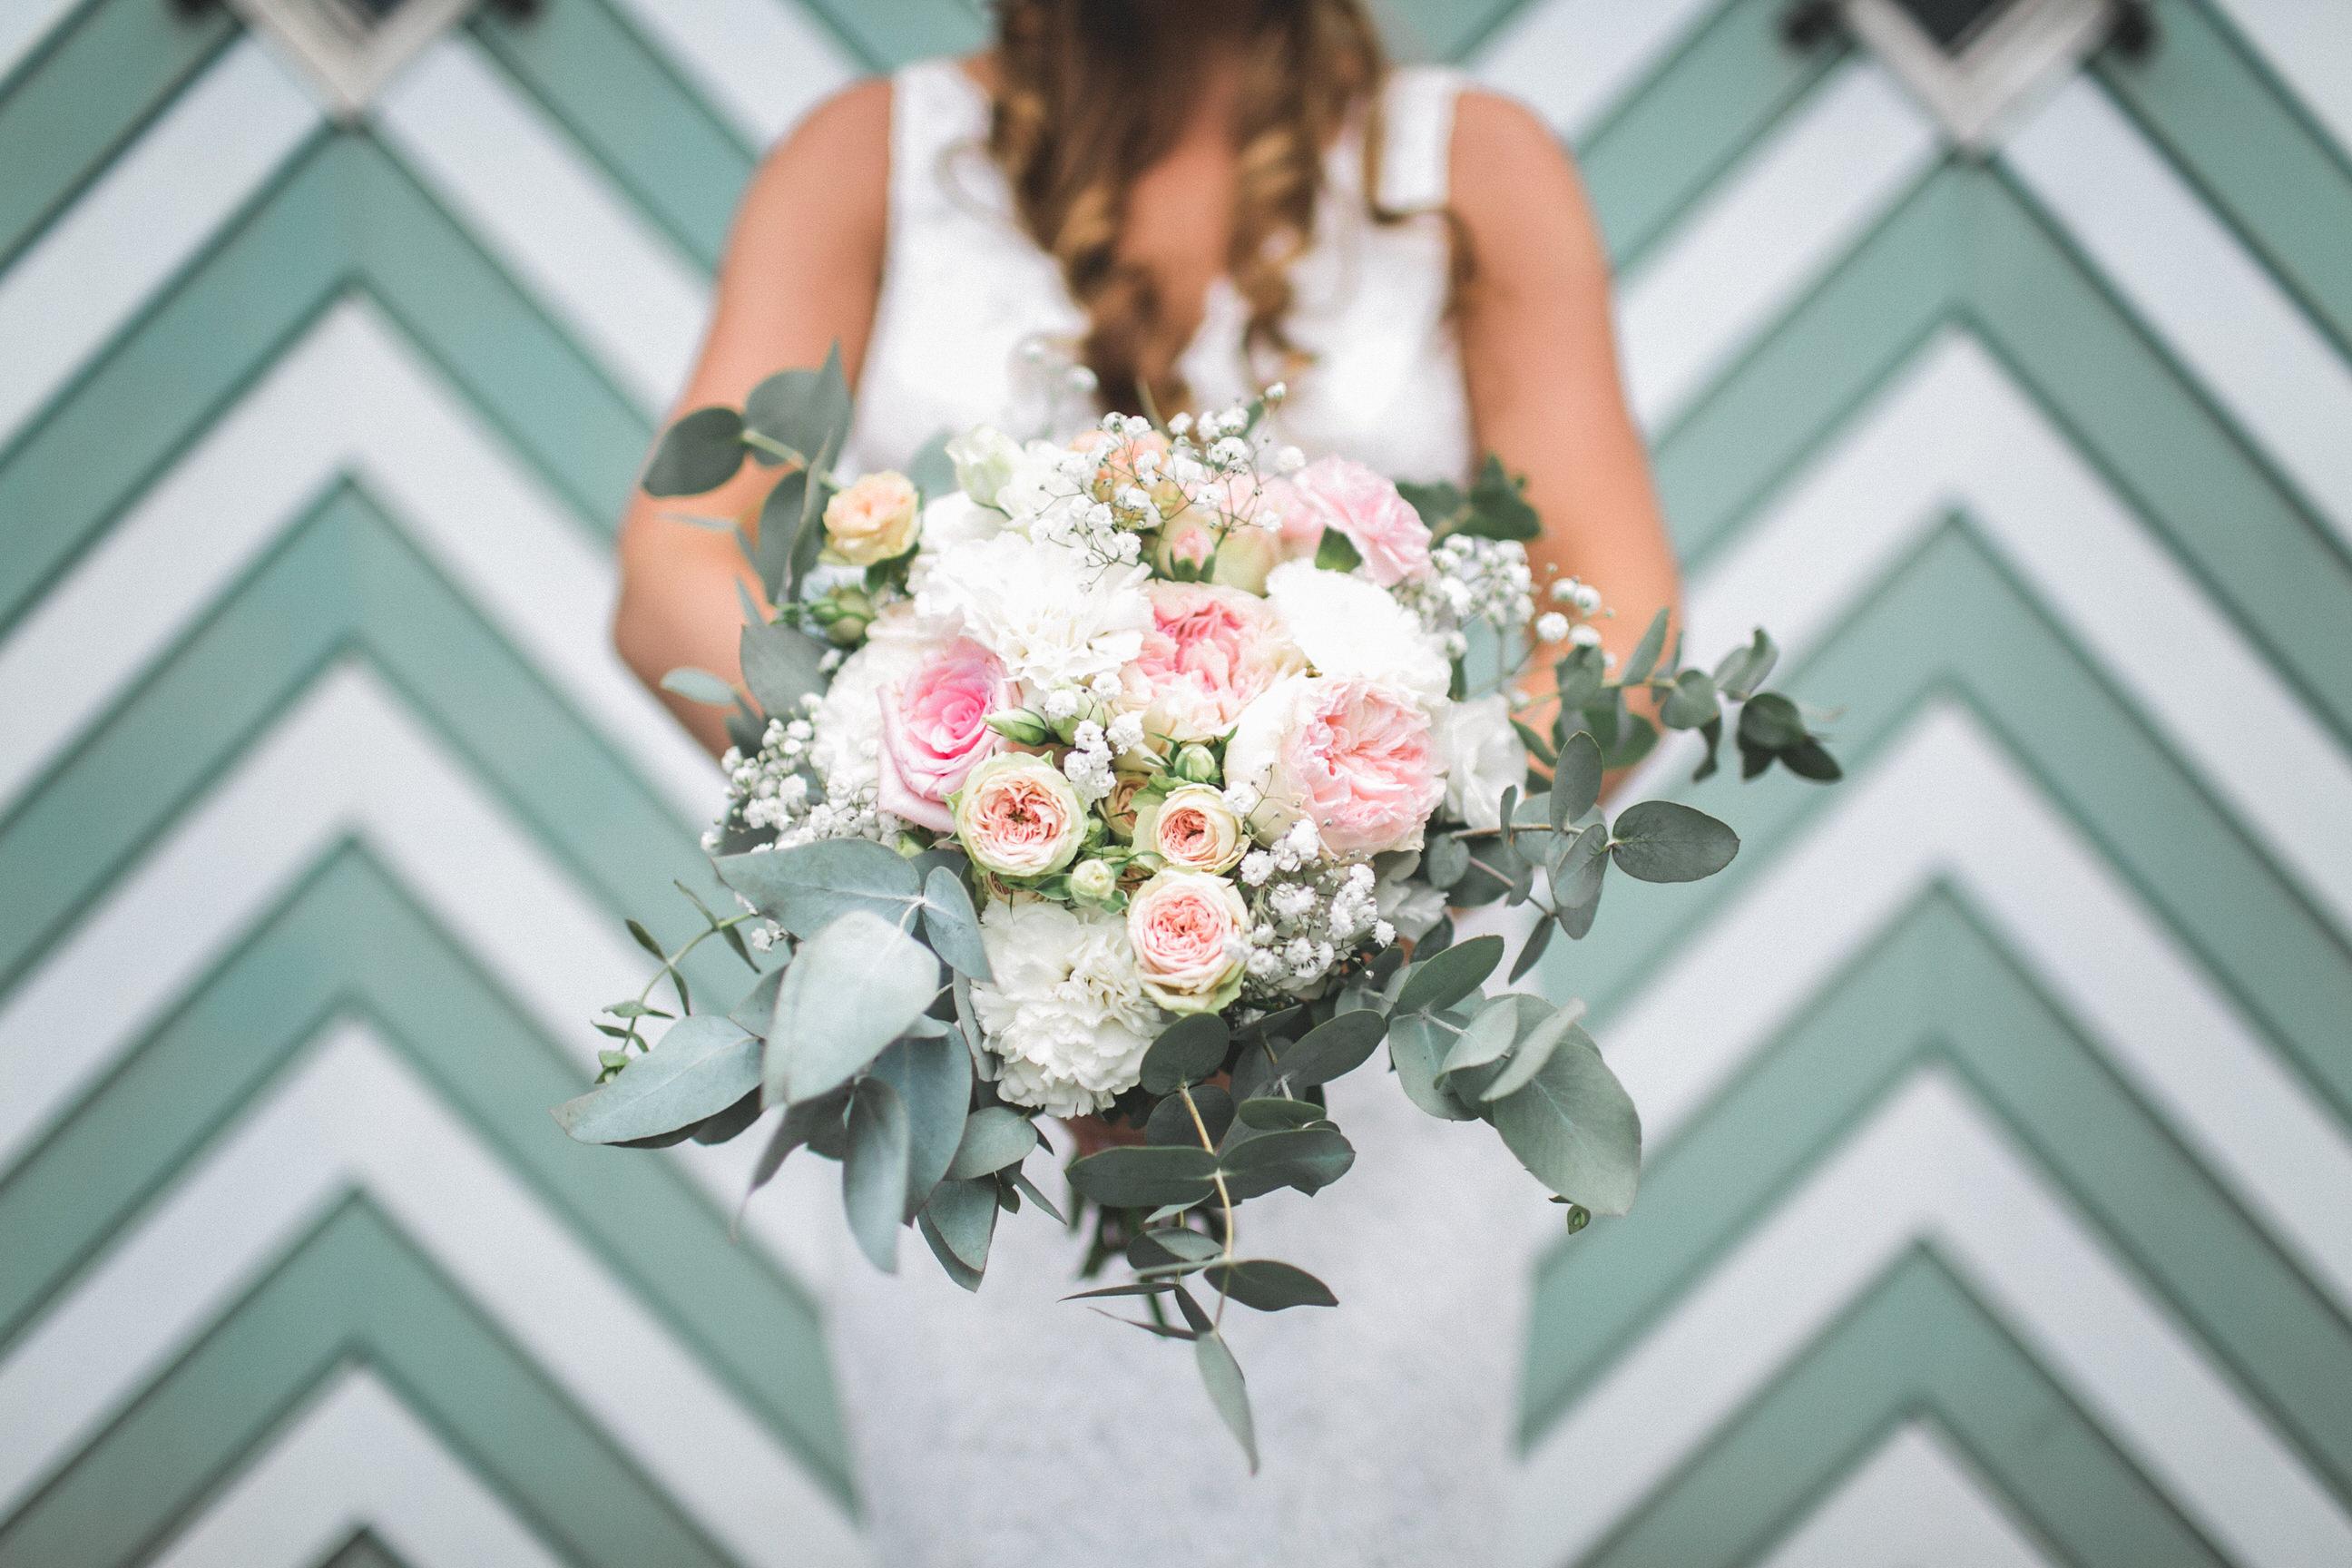 Sara Engis - Photography Blog